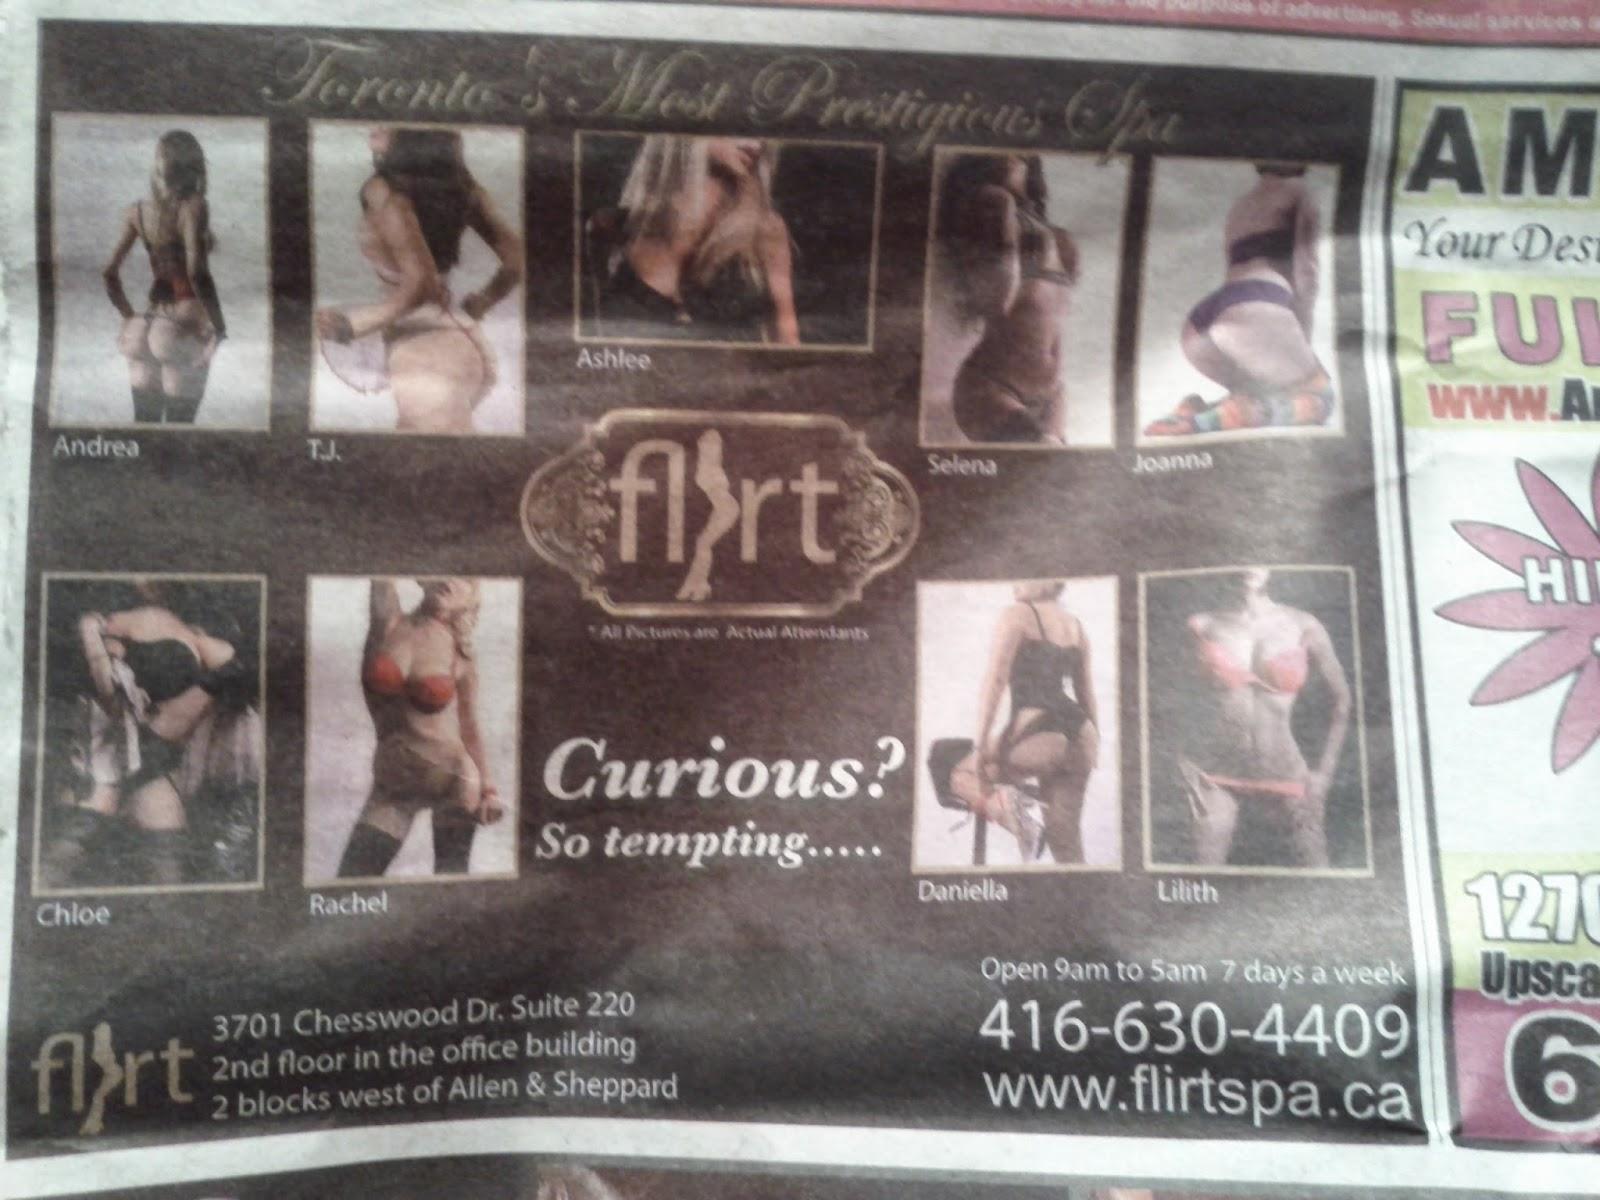 Flirt Spa Toronto